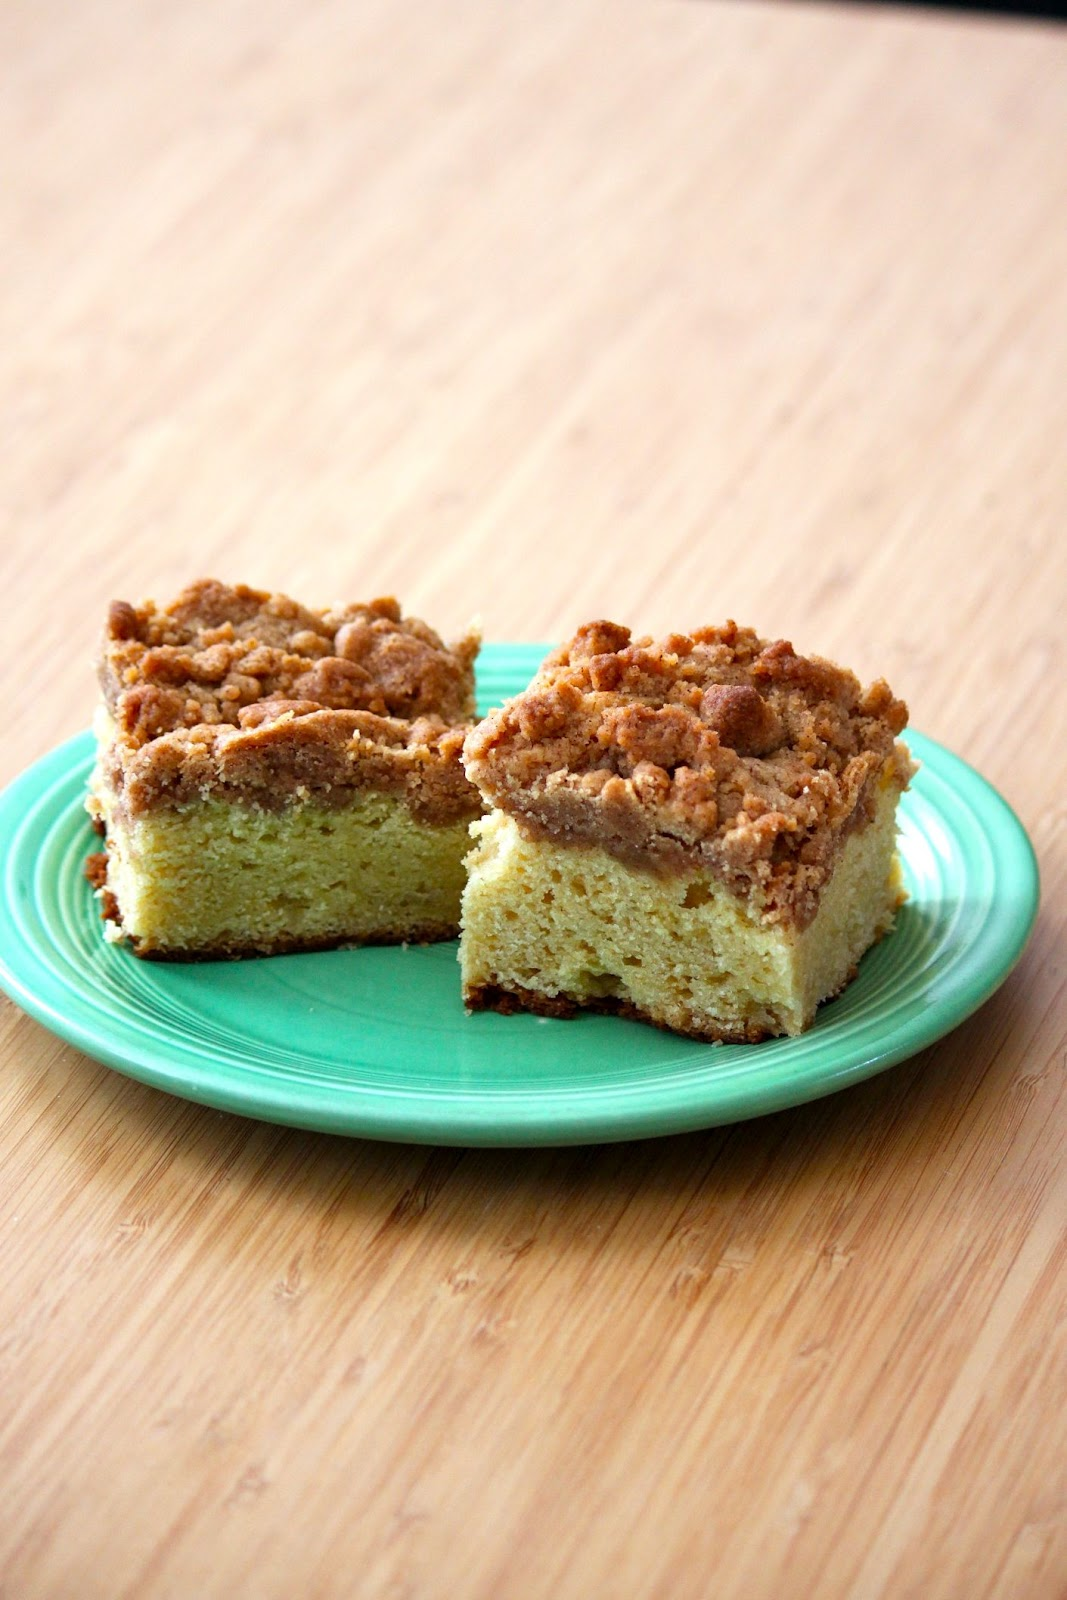 crumb cake gooseberry crumb cake calico crumb cake raspberry crumb ...